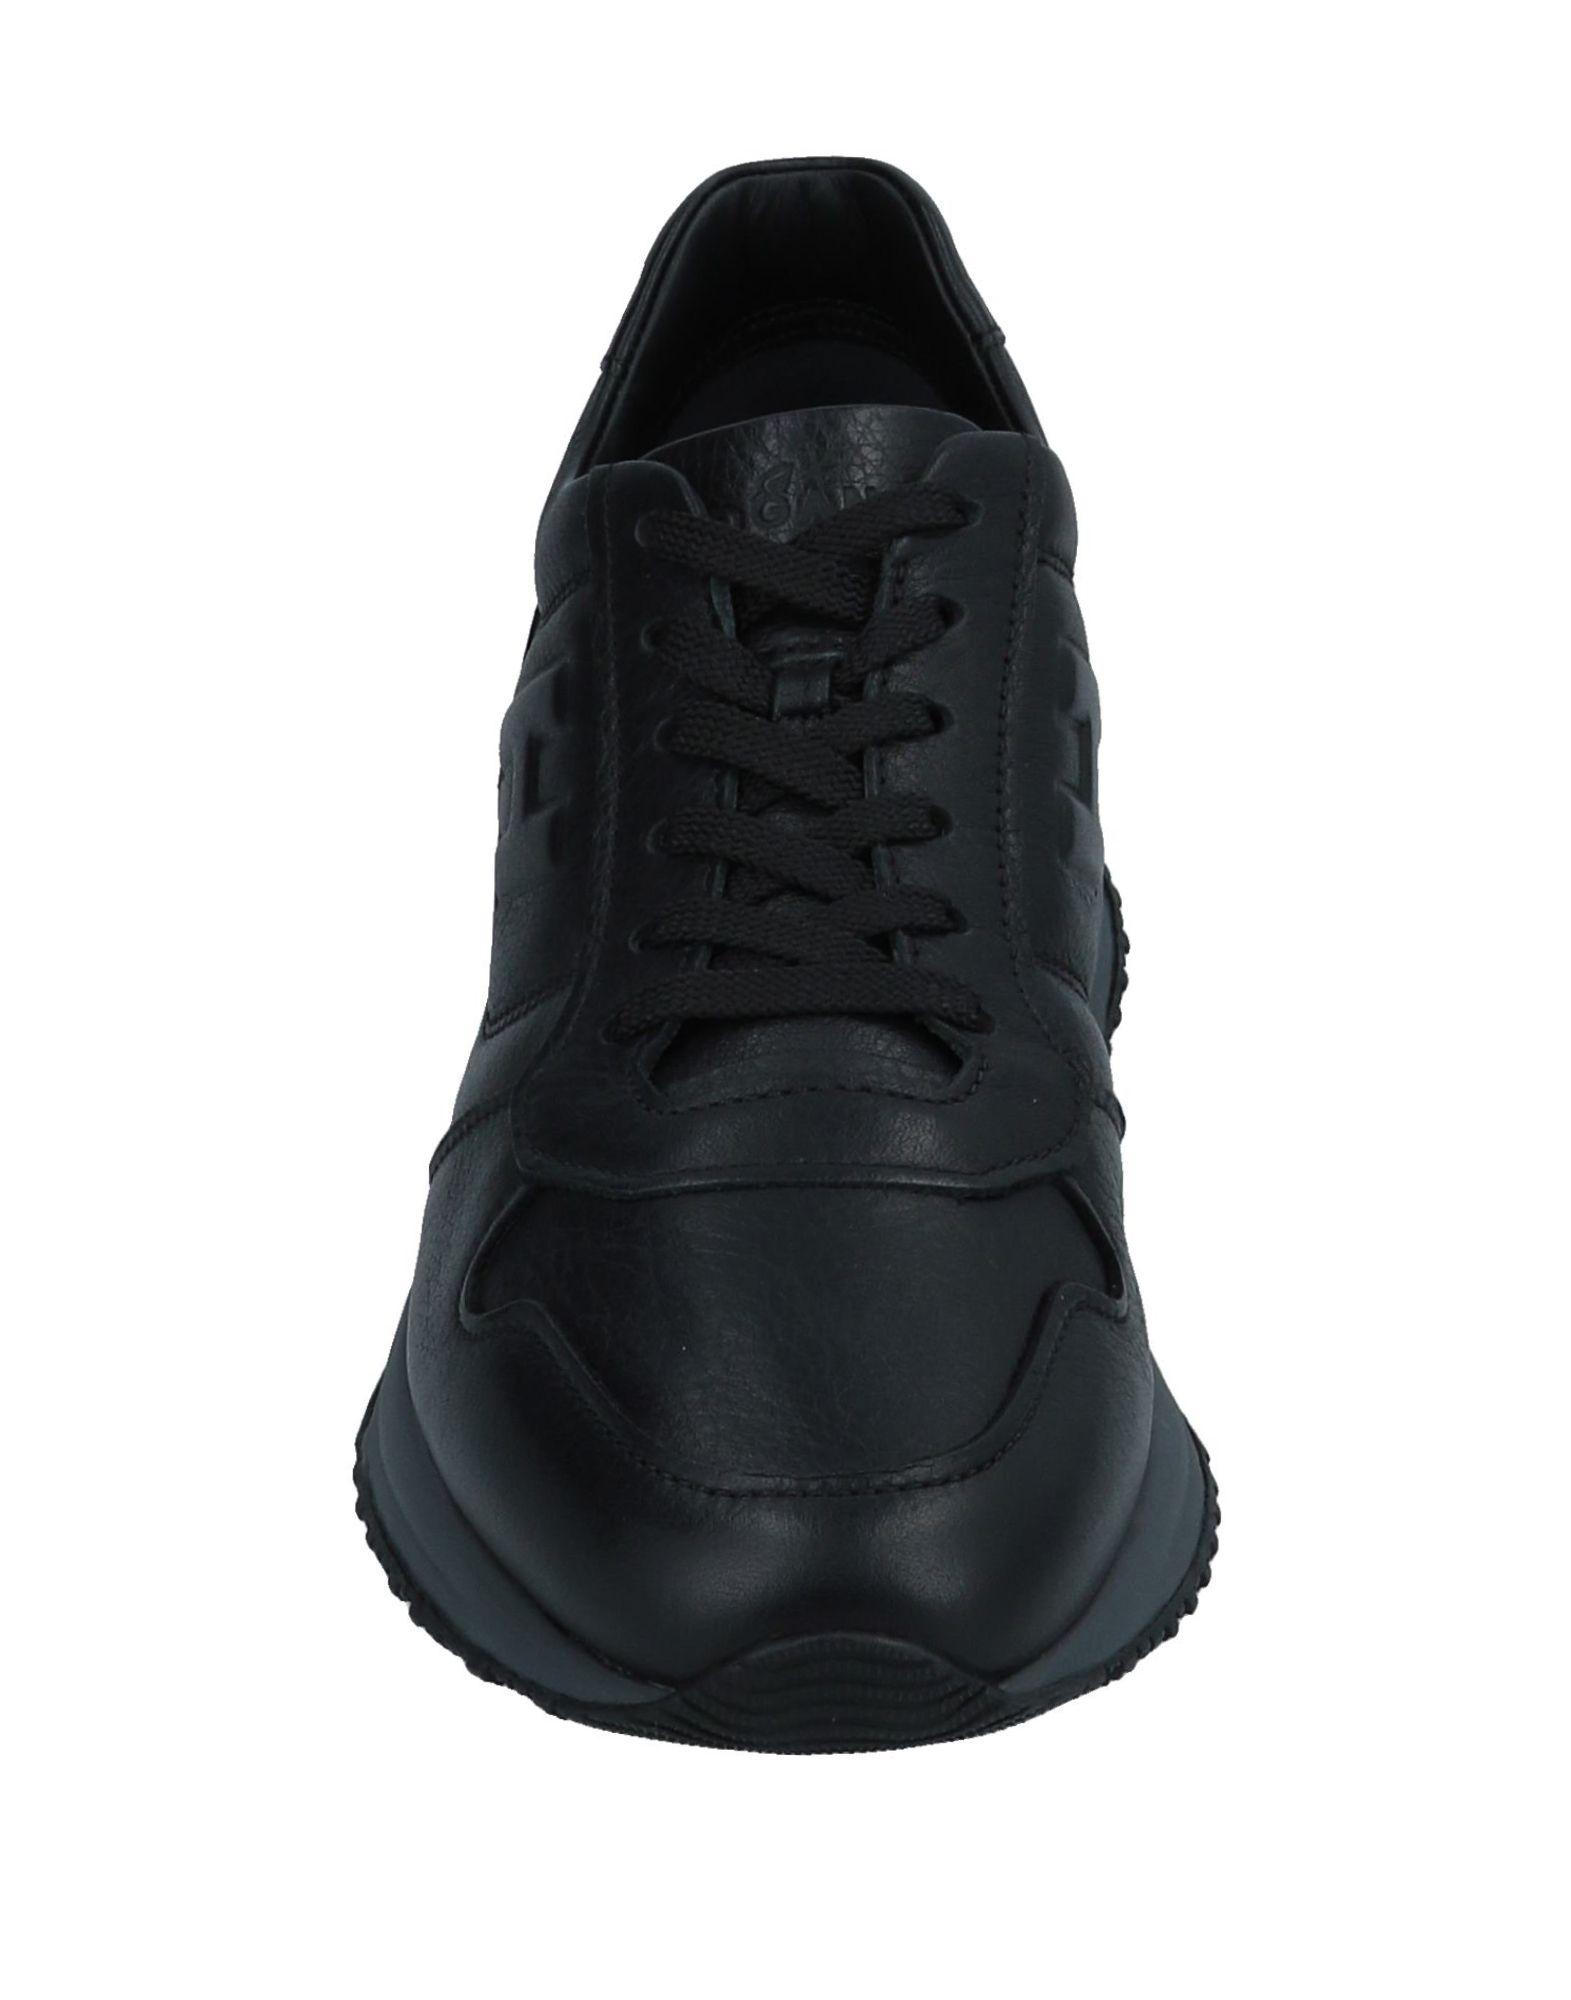 Hogan Sneakers Herren  Schuhe 11560587OV Gute Qualität beliebte Schuhe  3ea8d3